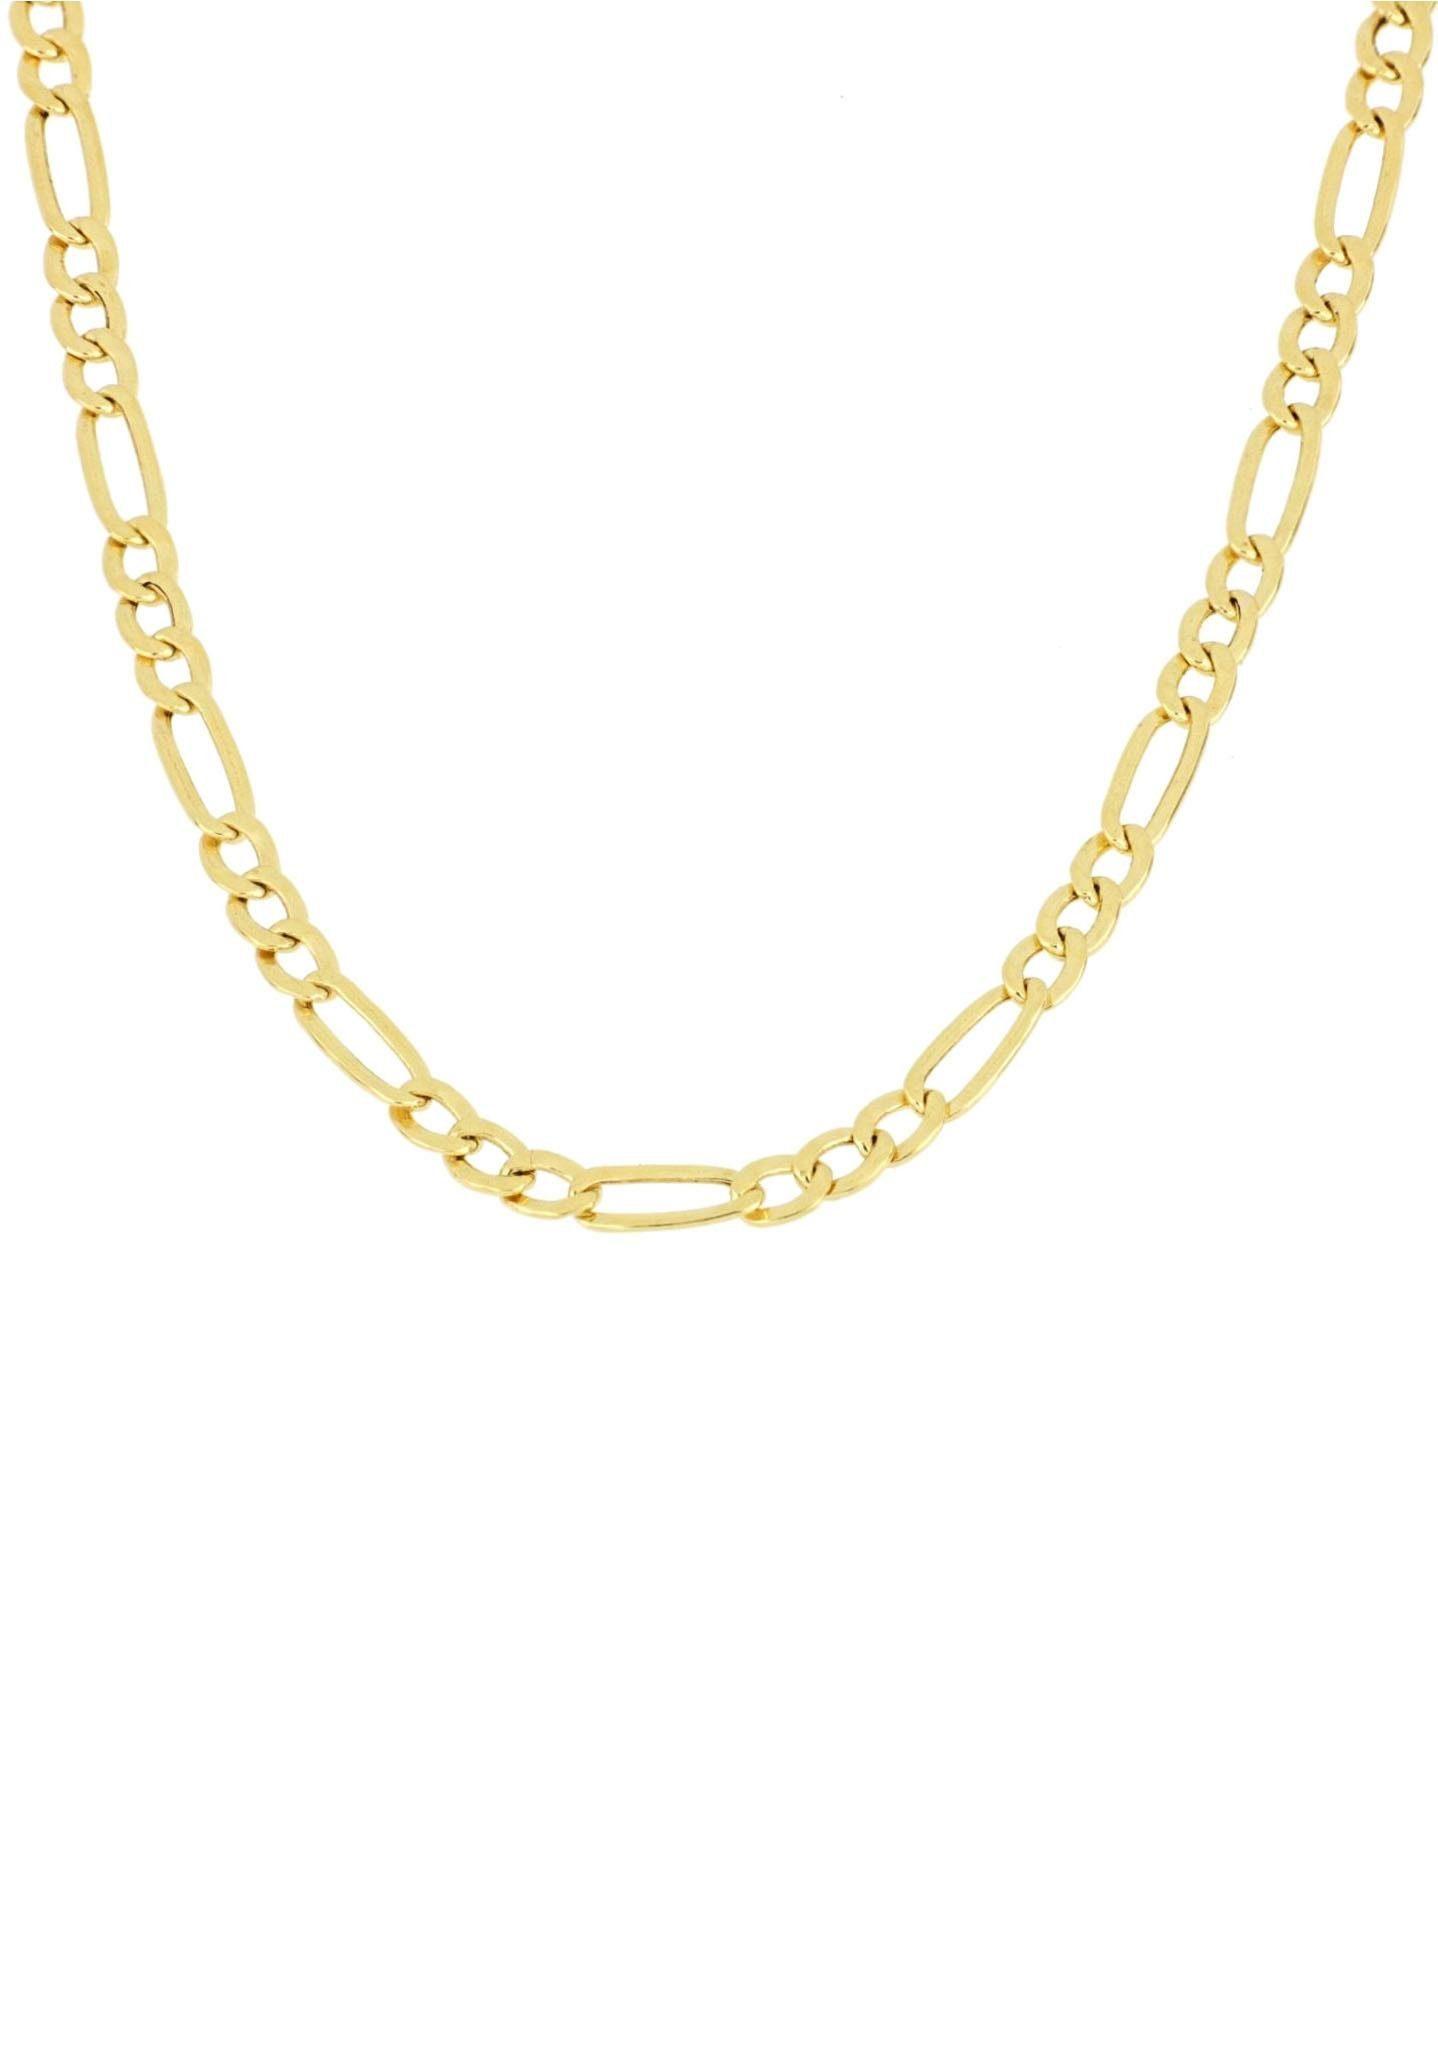 Firetti Collierkettchen »Figarokettengliederung, 2,5 mm, 2-fach diamantiert«